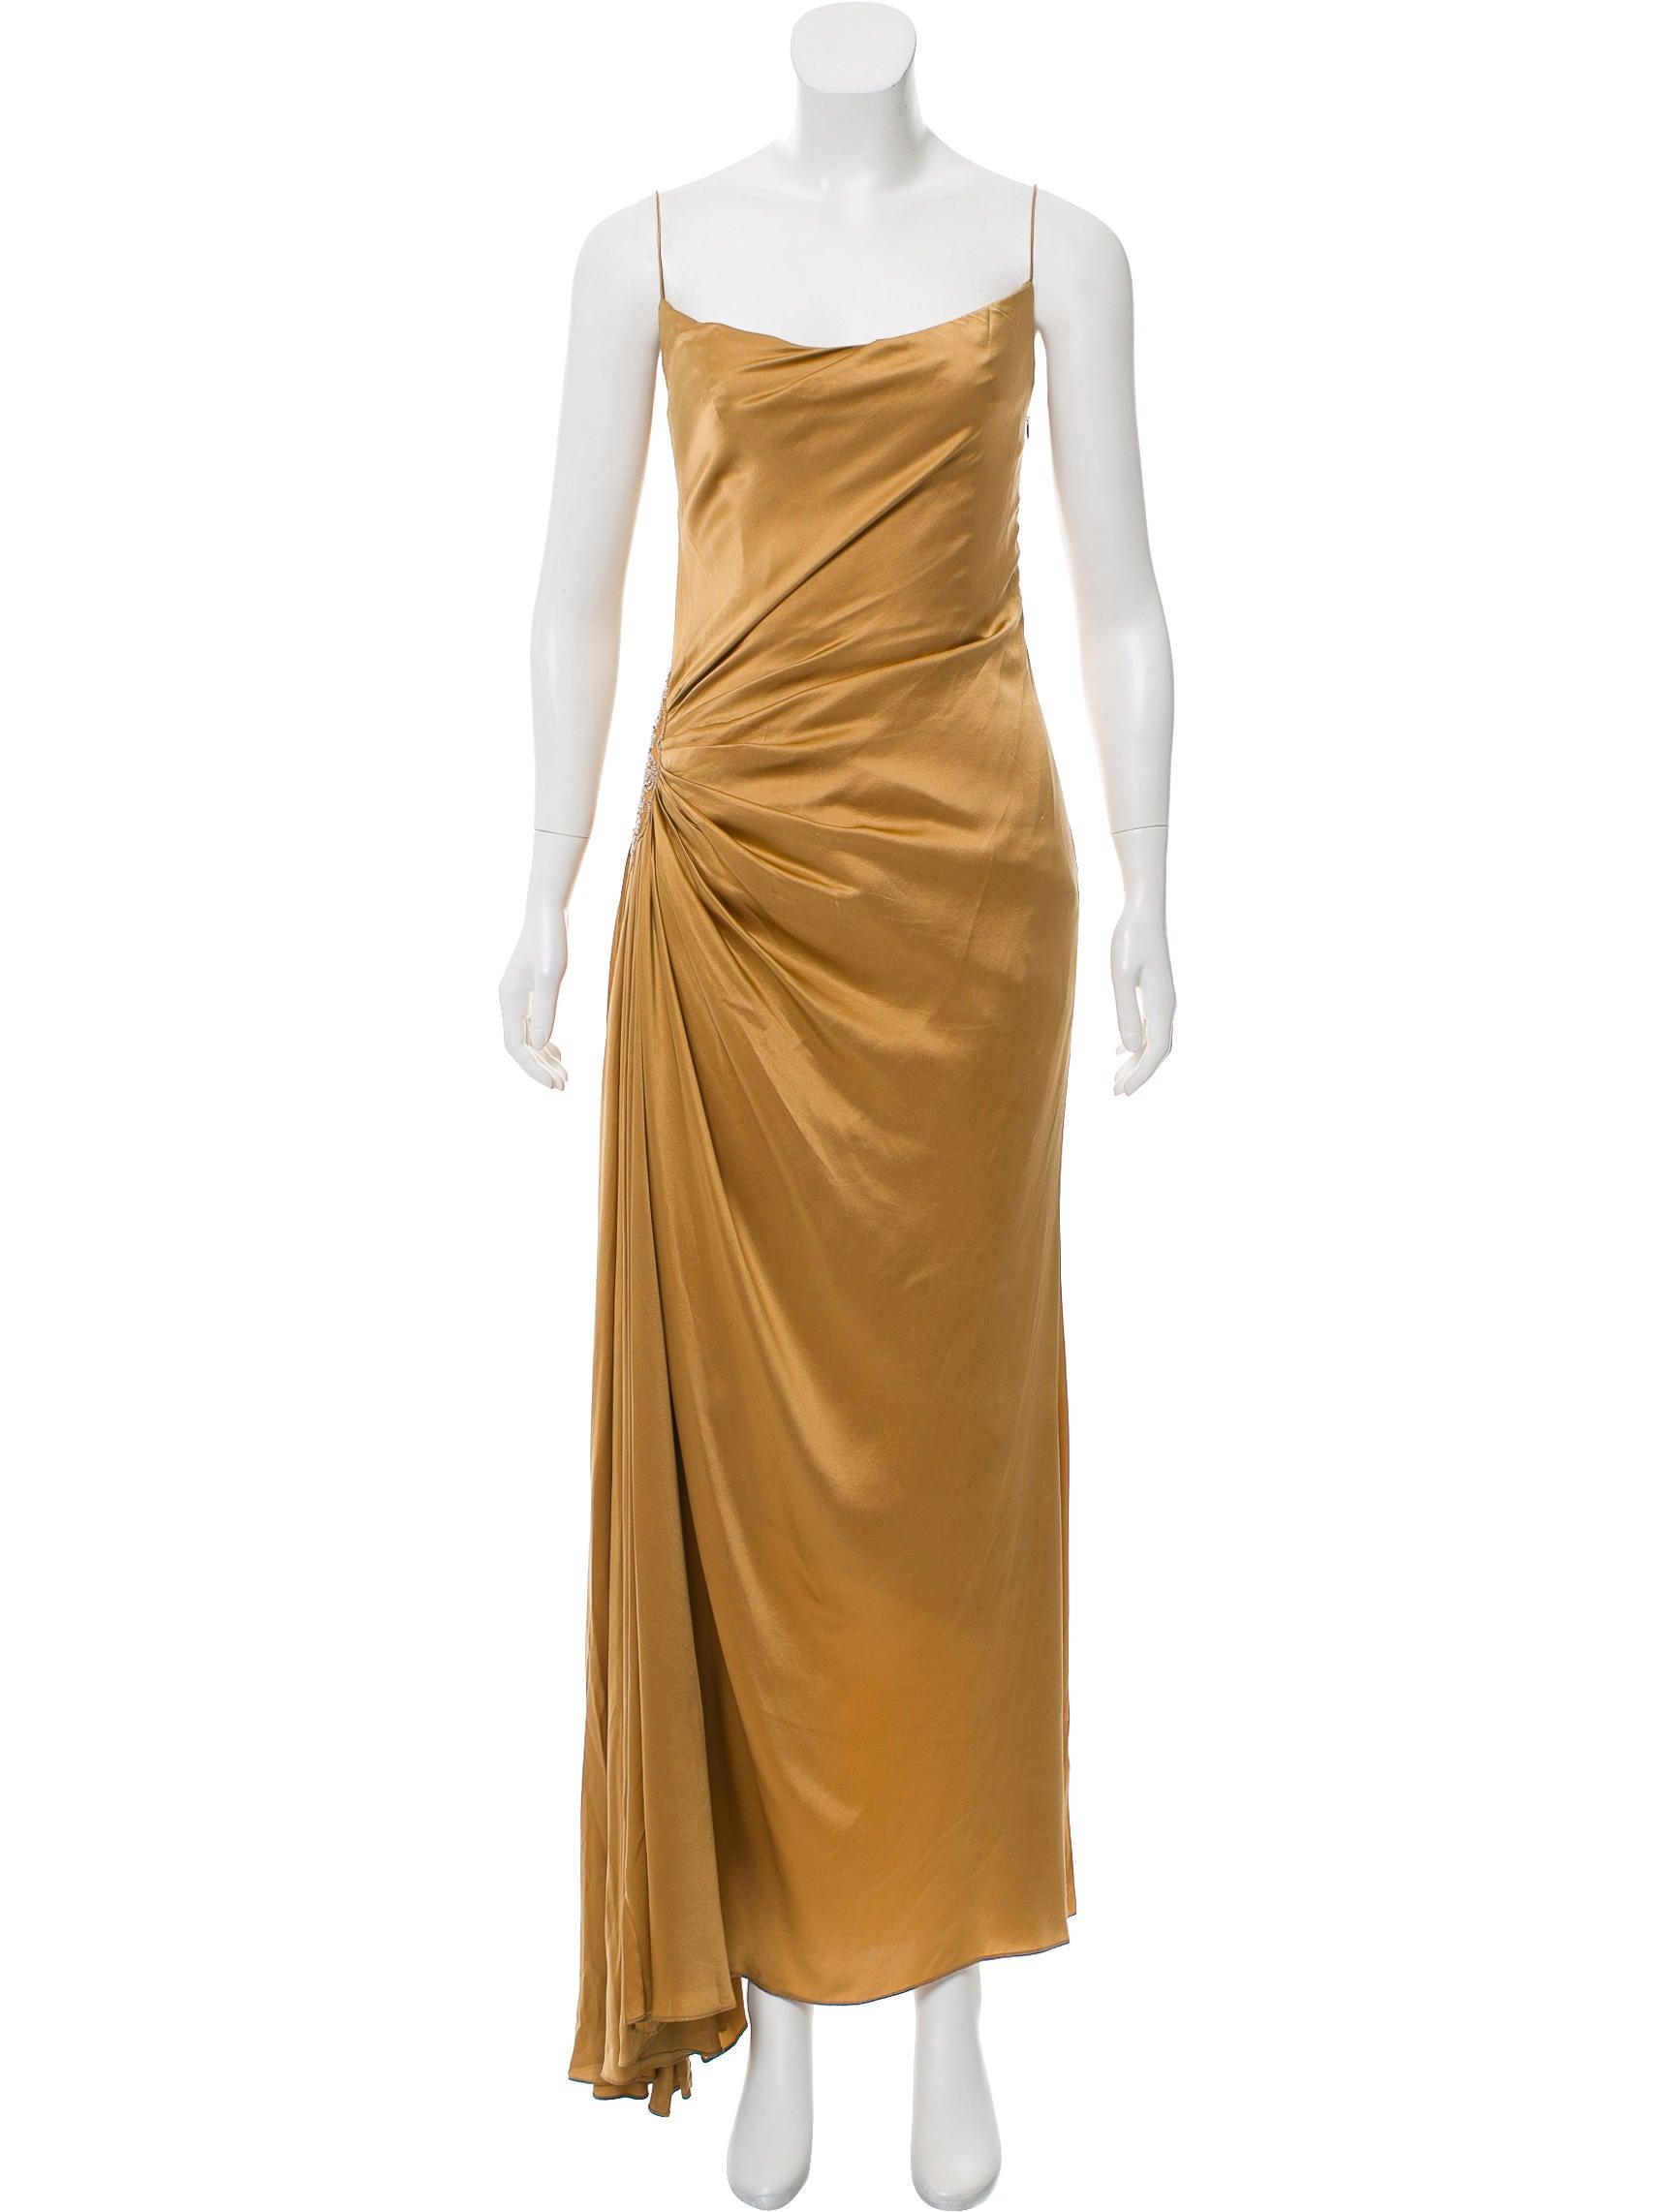 Reem Acra Sleeveless Evening Dress - Clothing - REM20340 | The RealReal